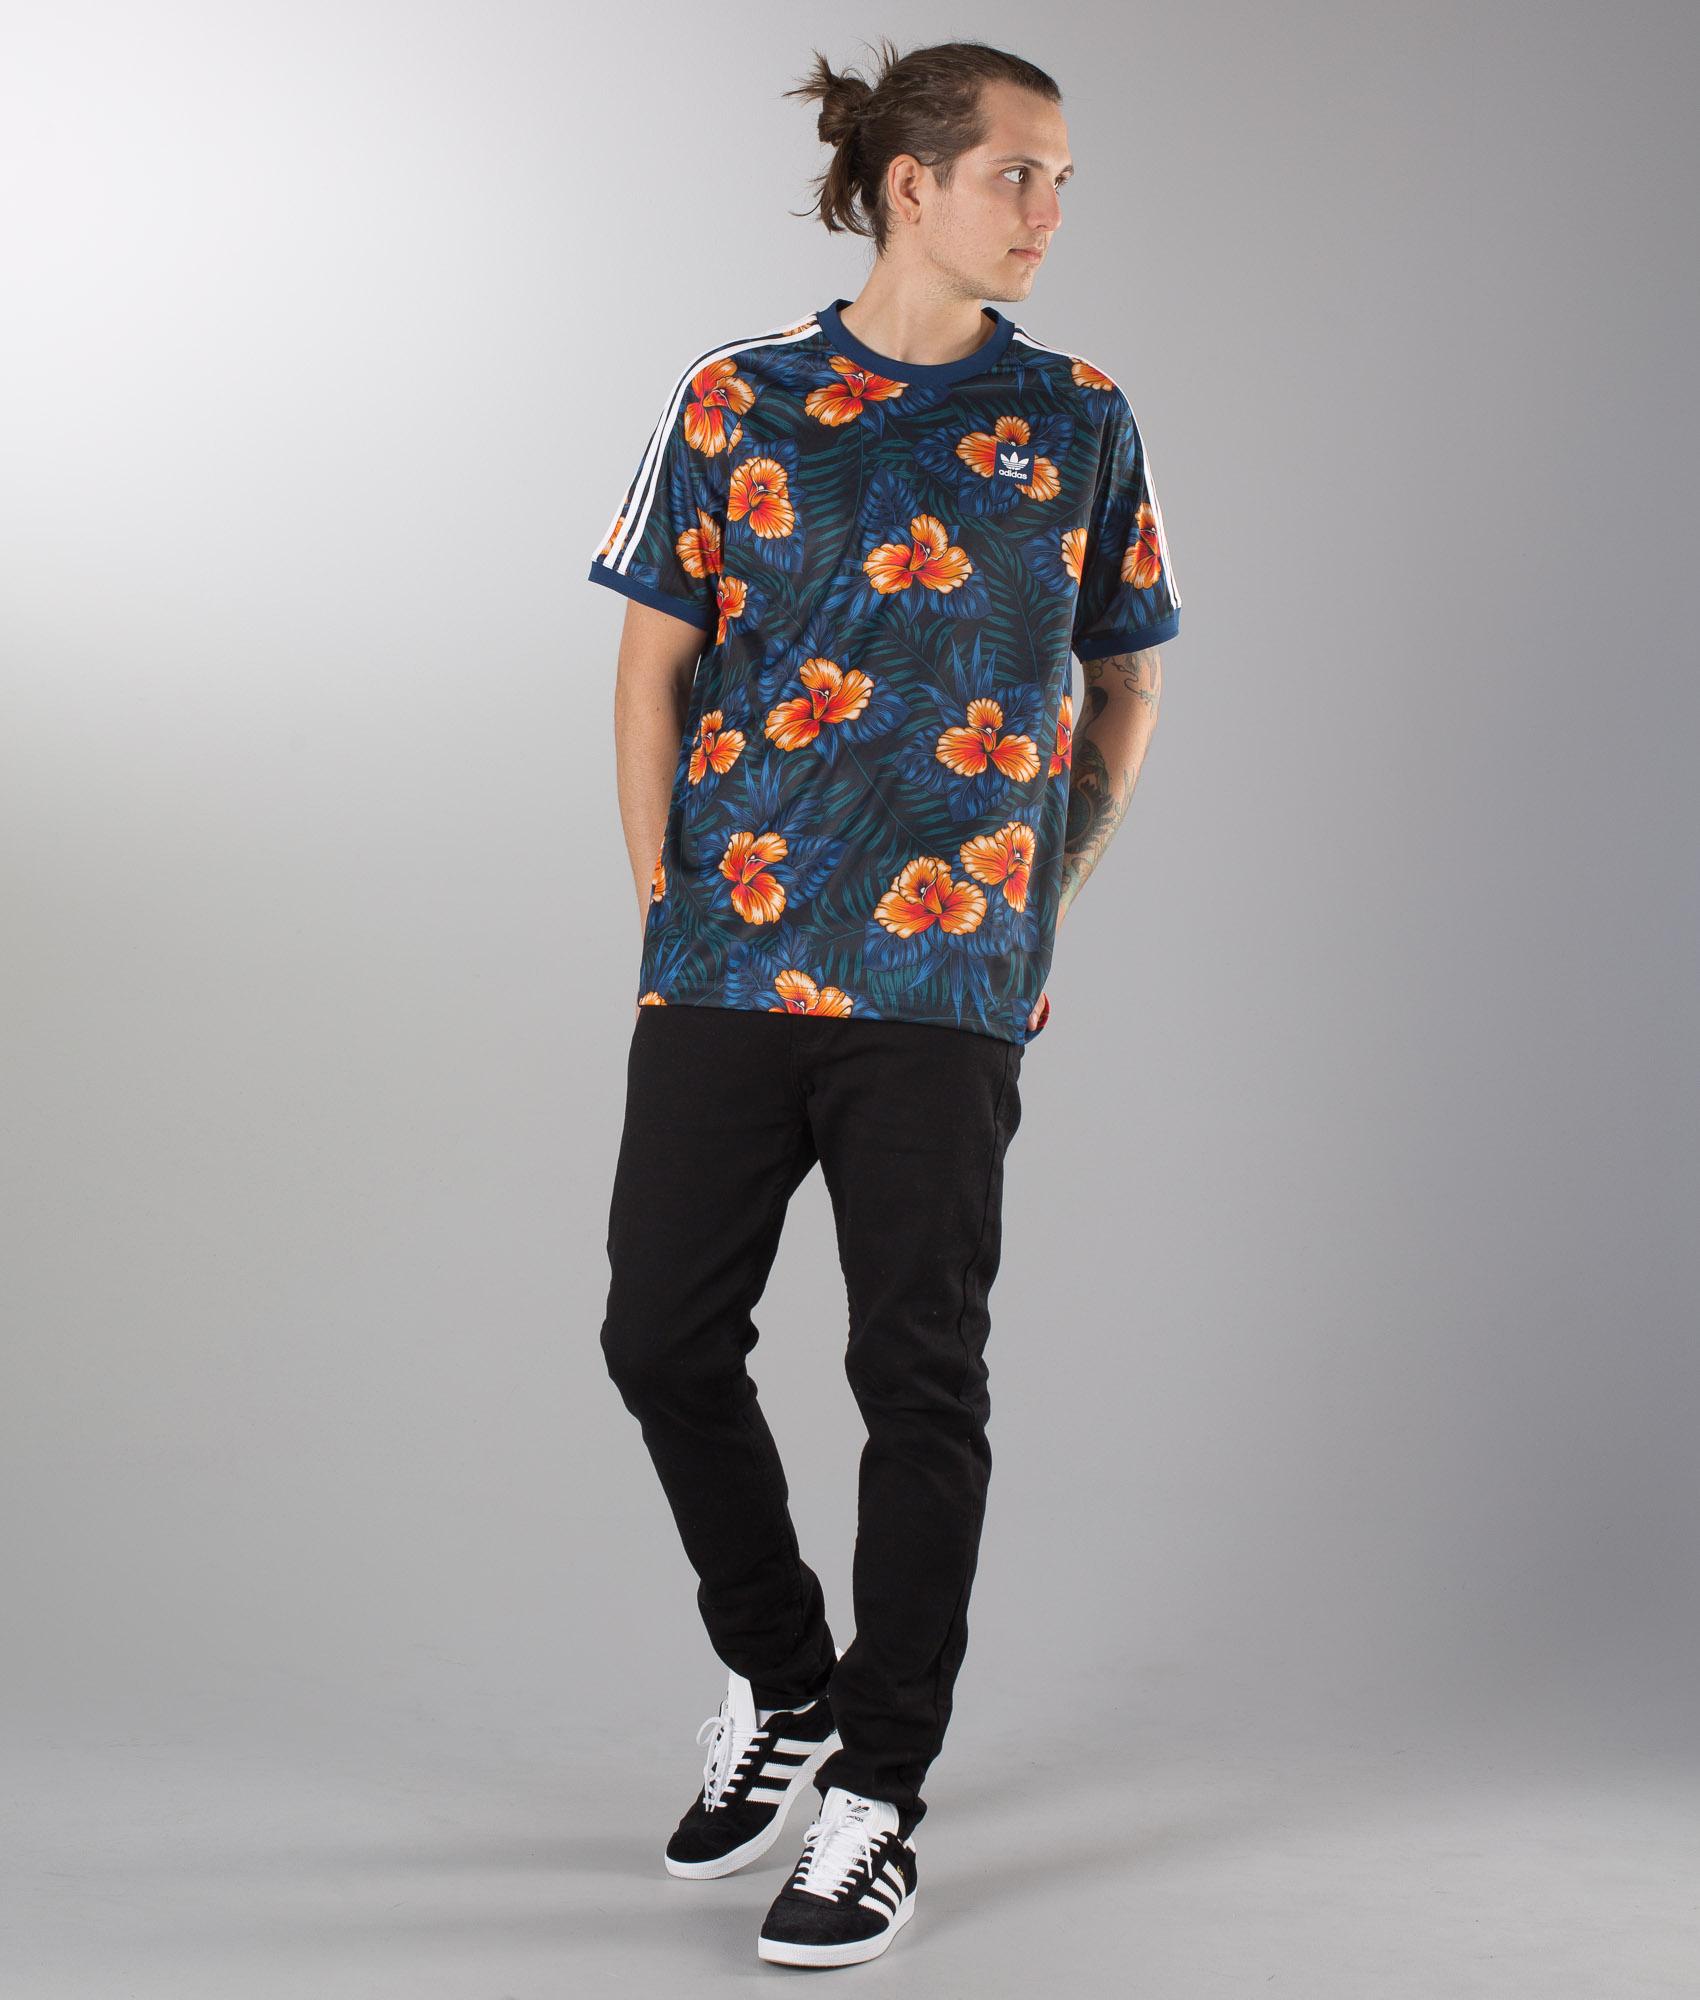 adidas floral t shirt